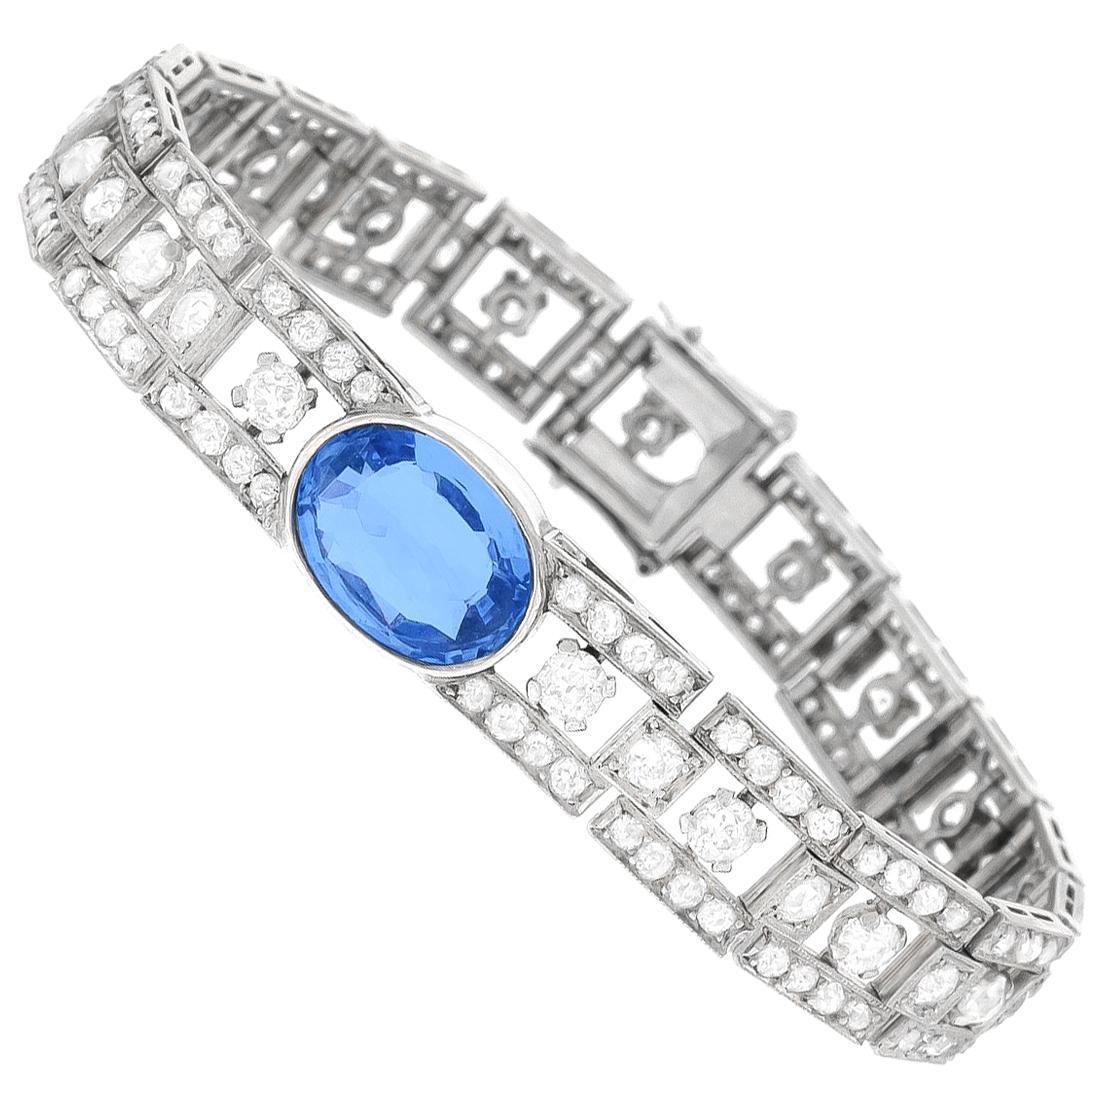 Art Deco Sapphire and Diamond Set Platinum Bracelet